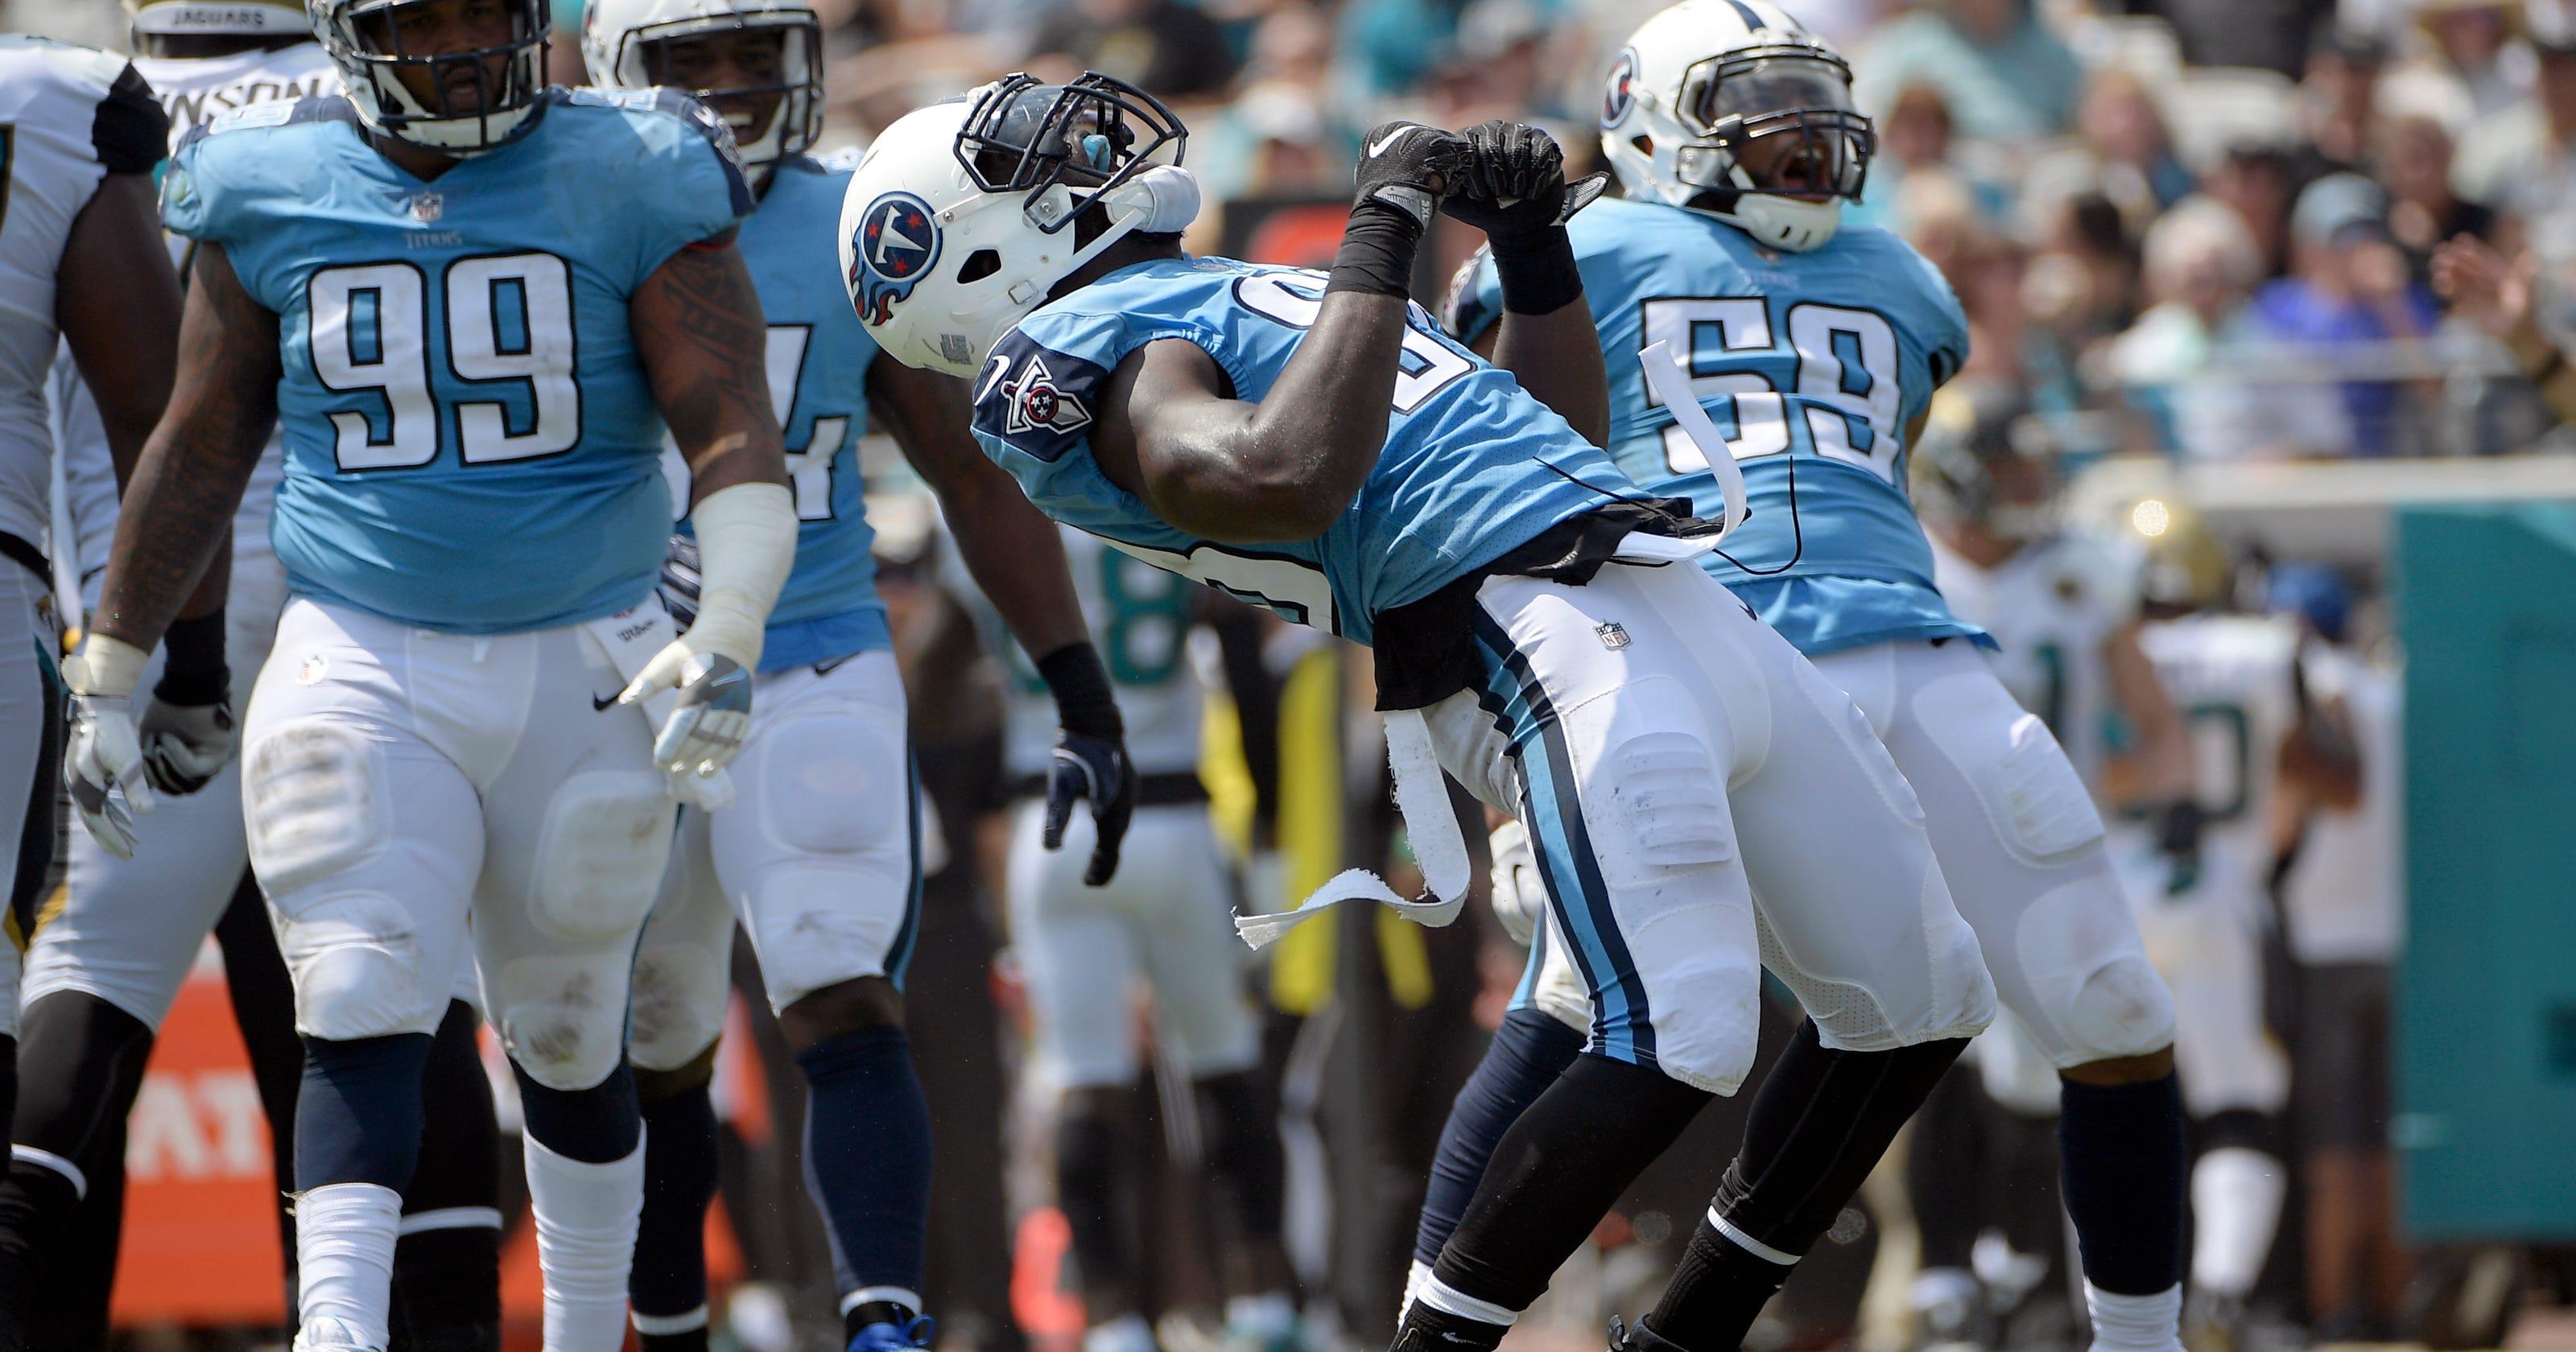 31cc5a78e Titans' defense among NFL's best since embarrassing loss